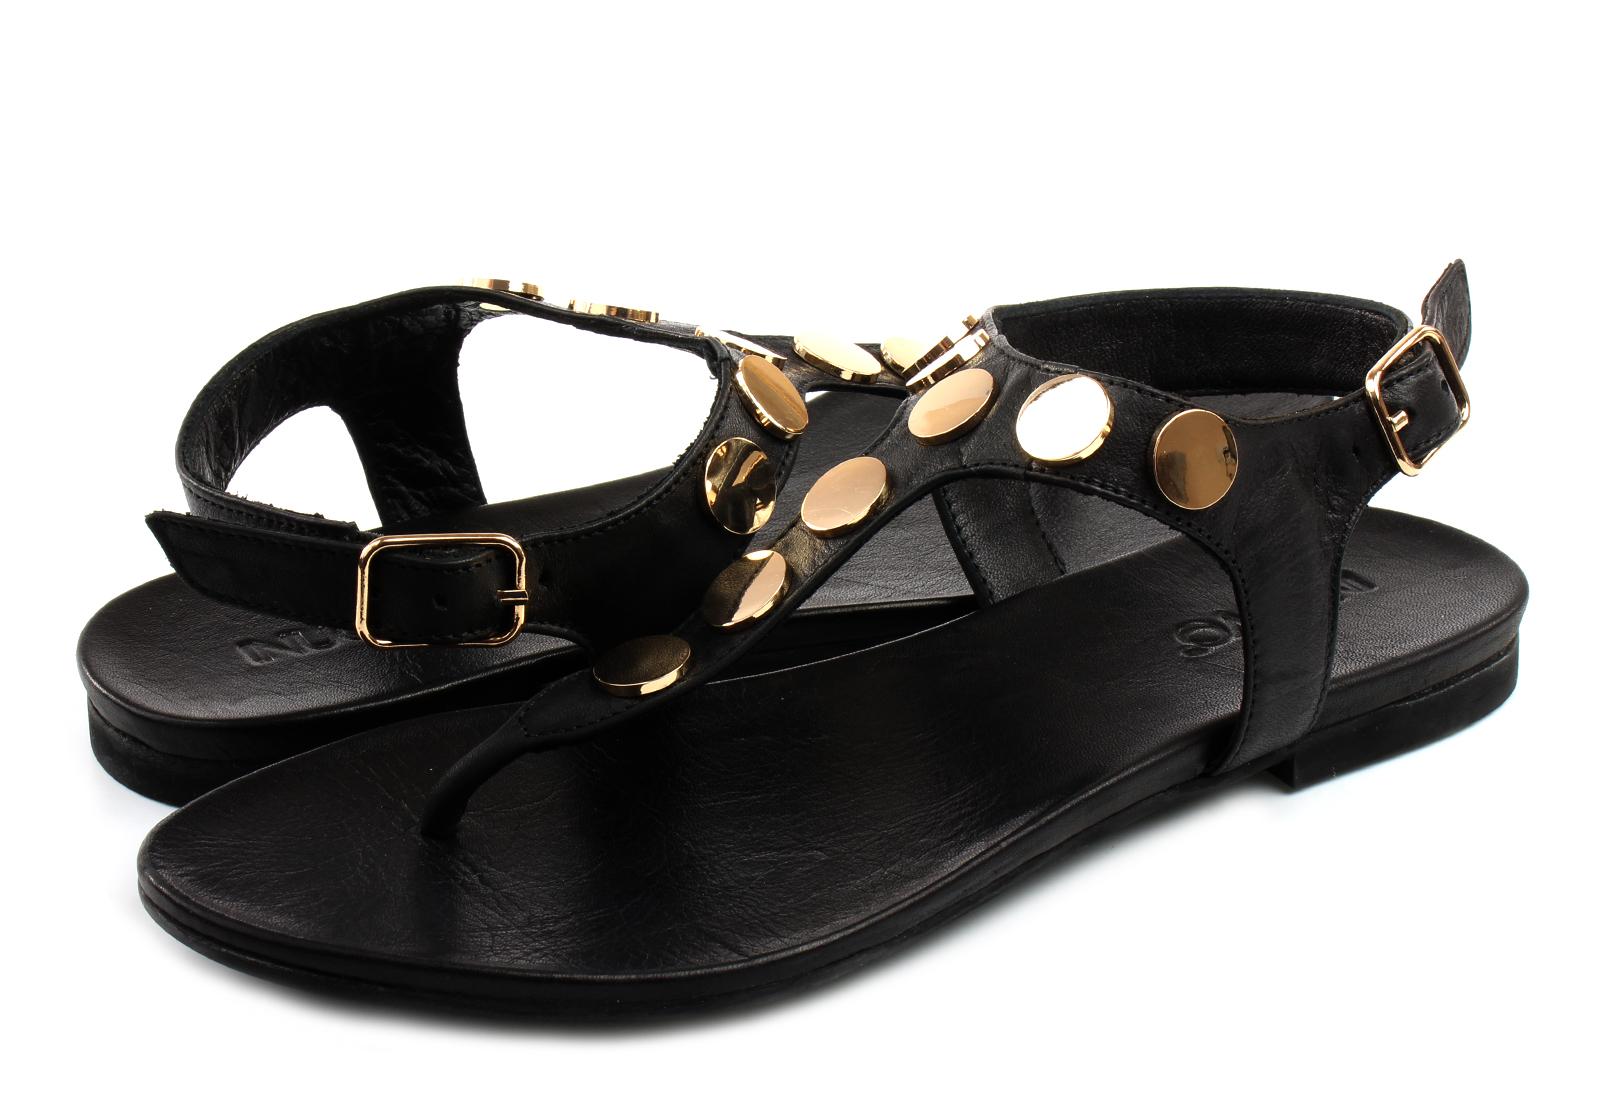 Inuovo Sandale 8452